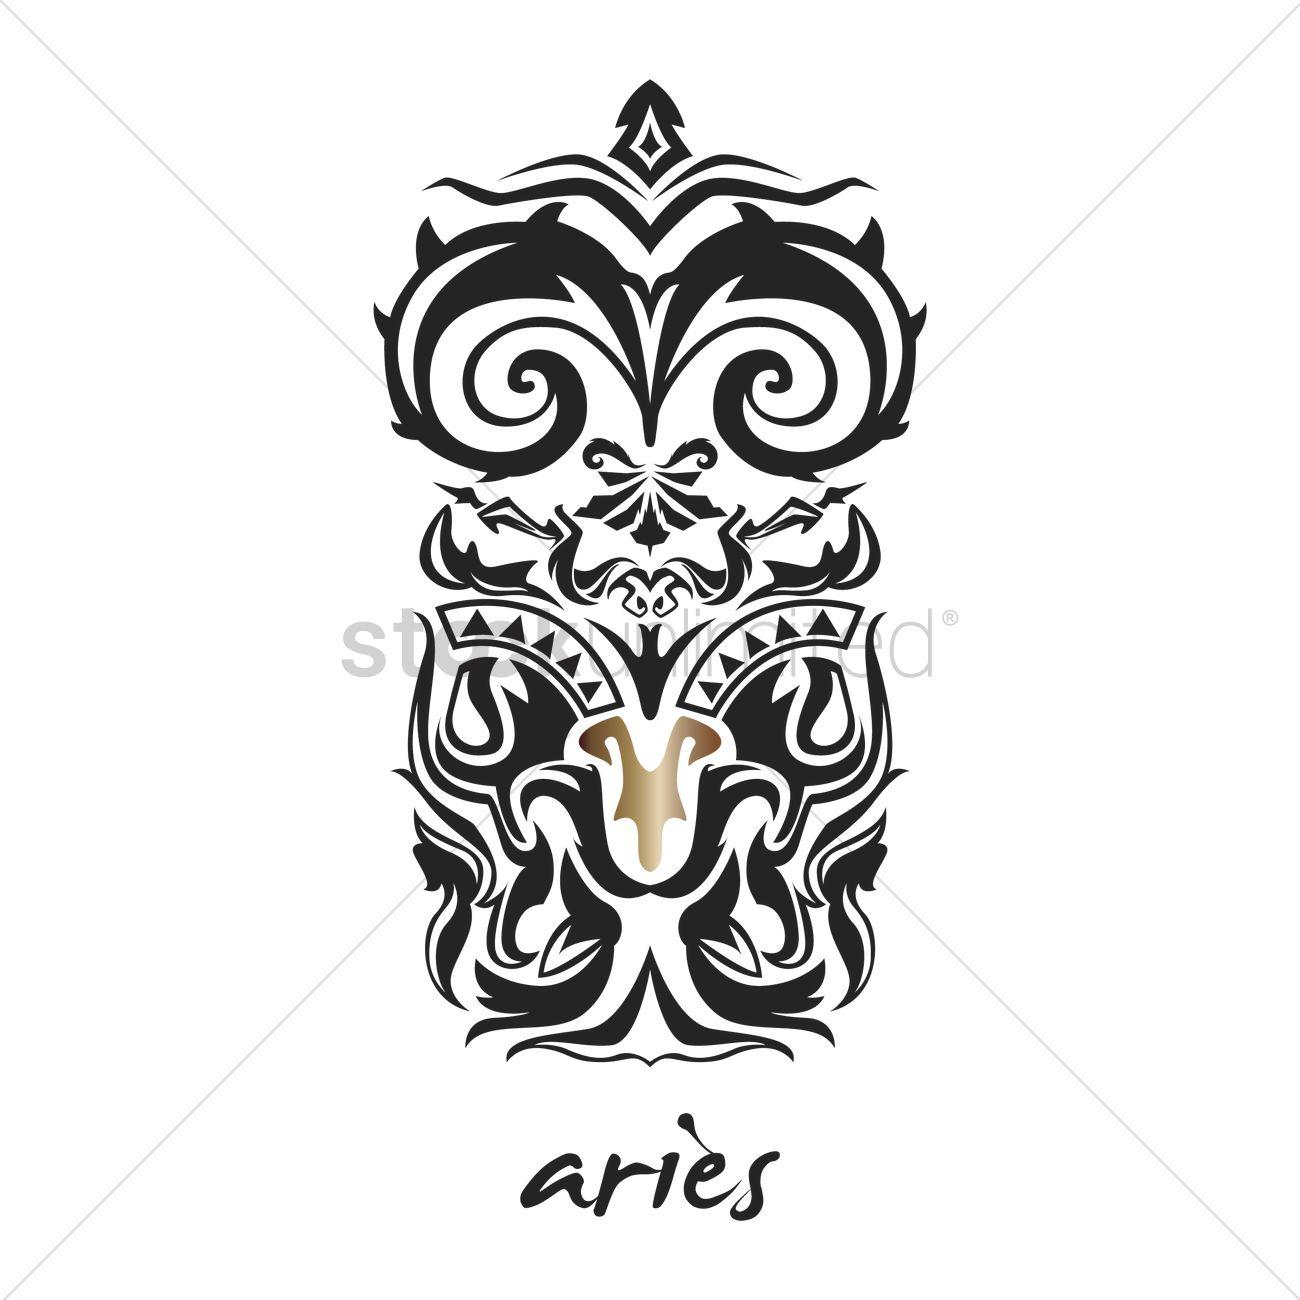 Aries tattoo horoscope design vector image 1969160 stockunlimited aries tattoo horoscope design vector graphic biocorpaavc